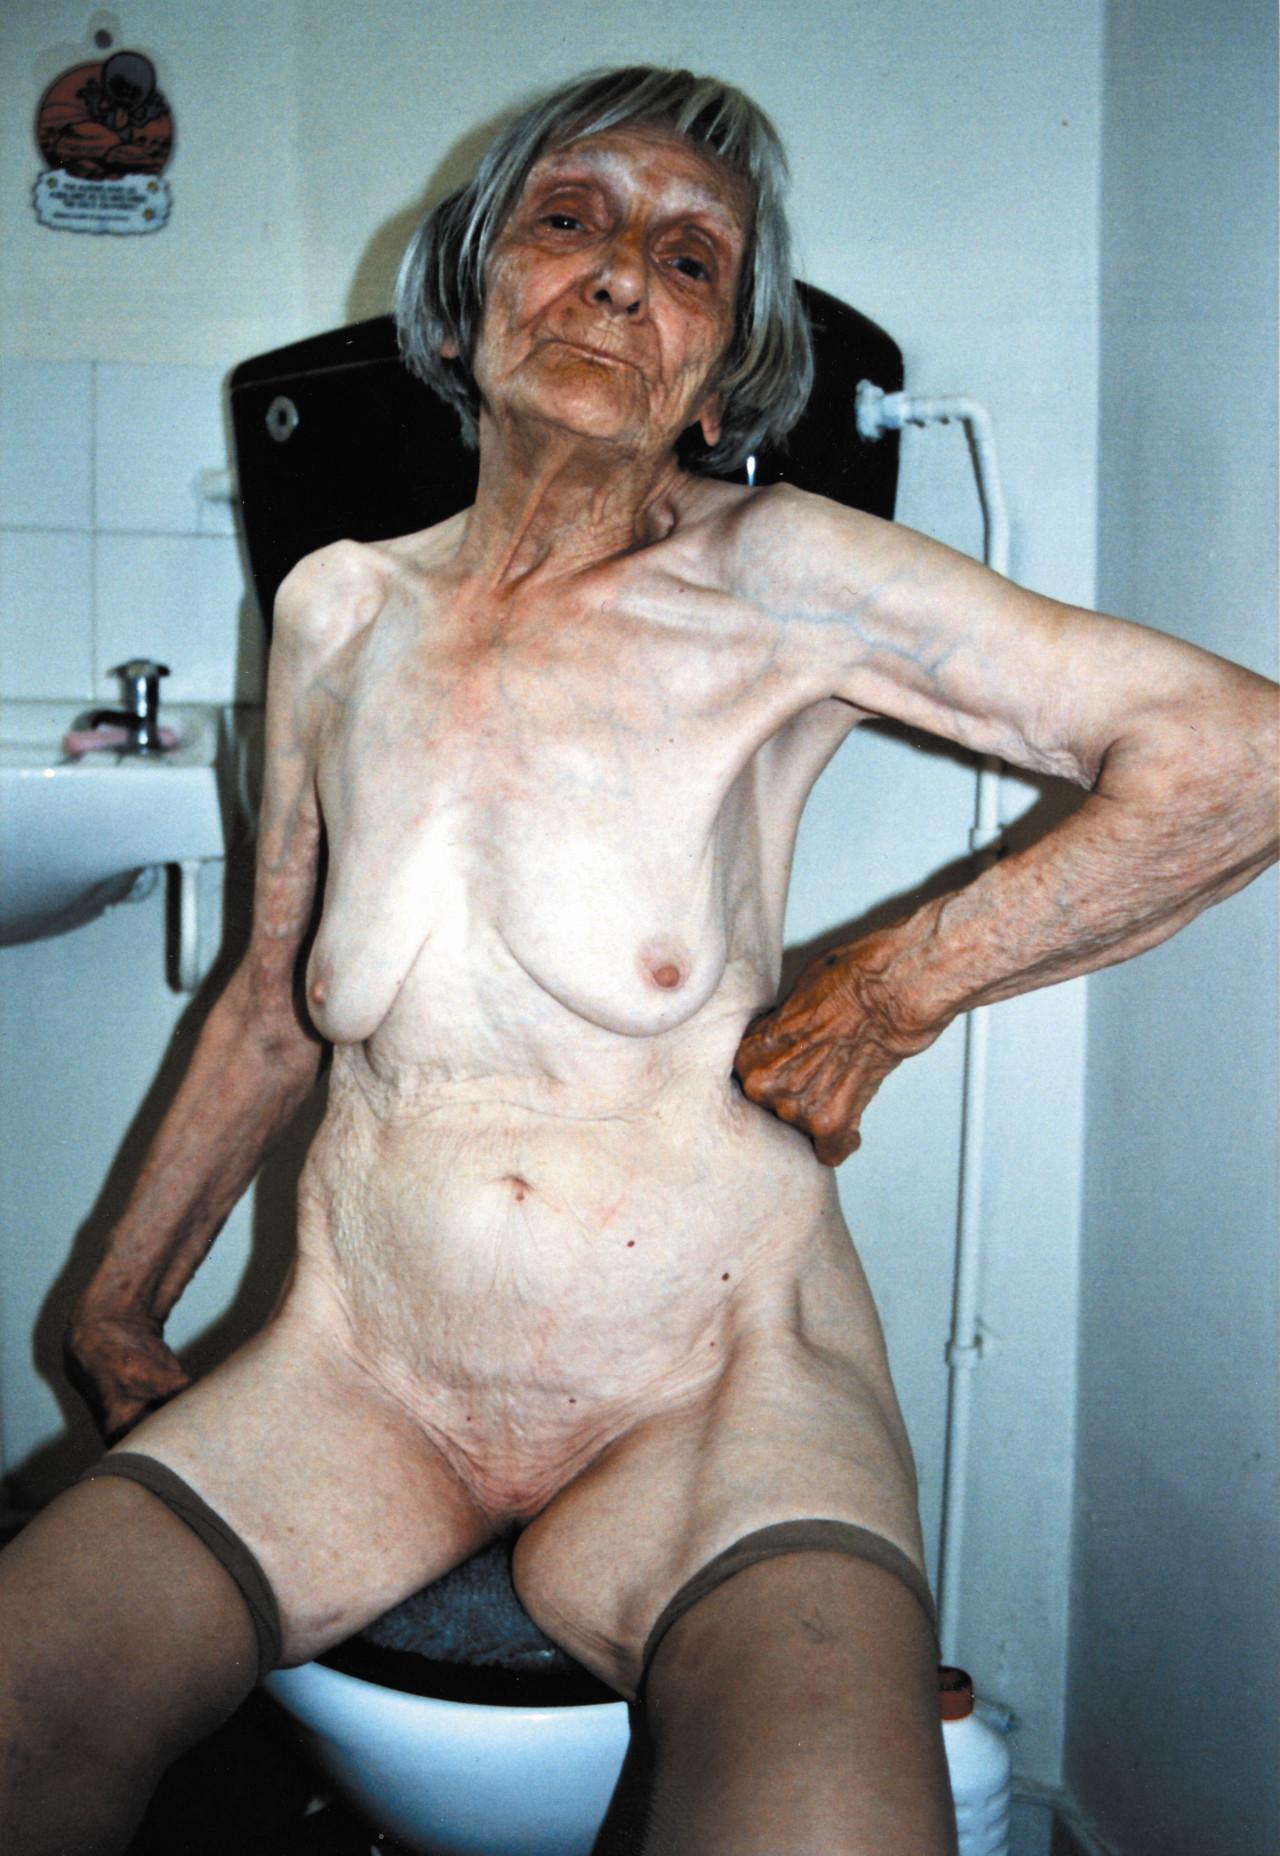 very old grannies tumblr - DATAWAV